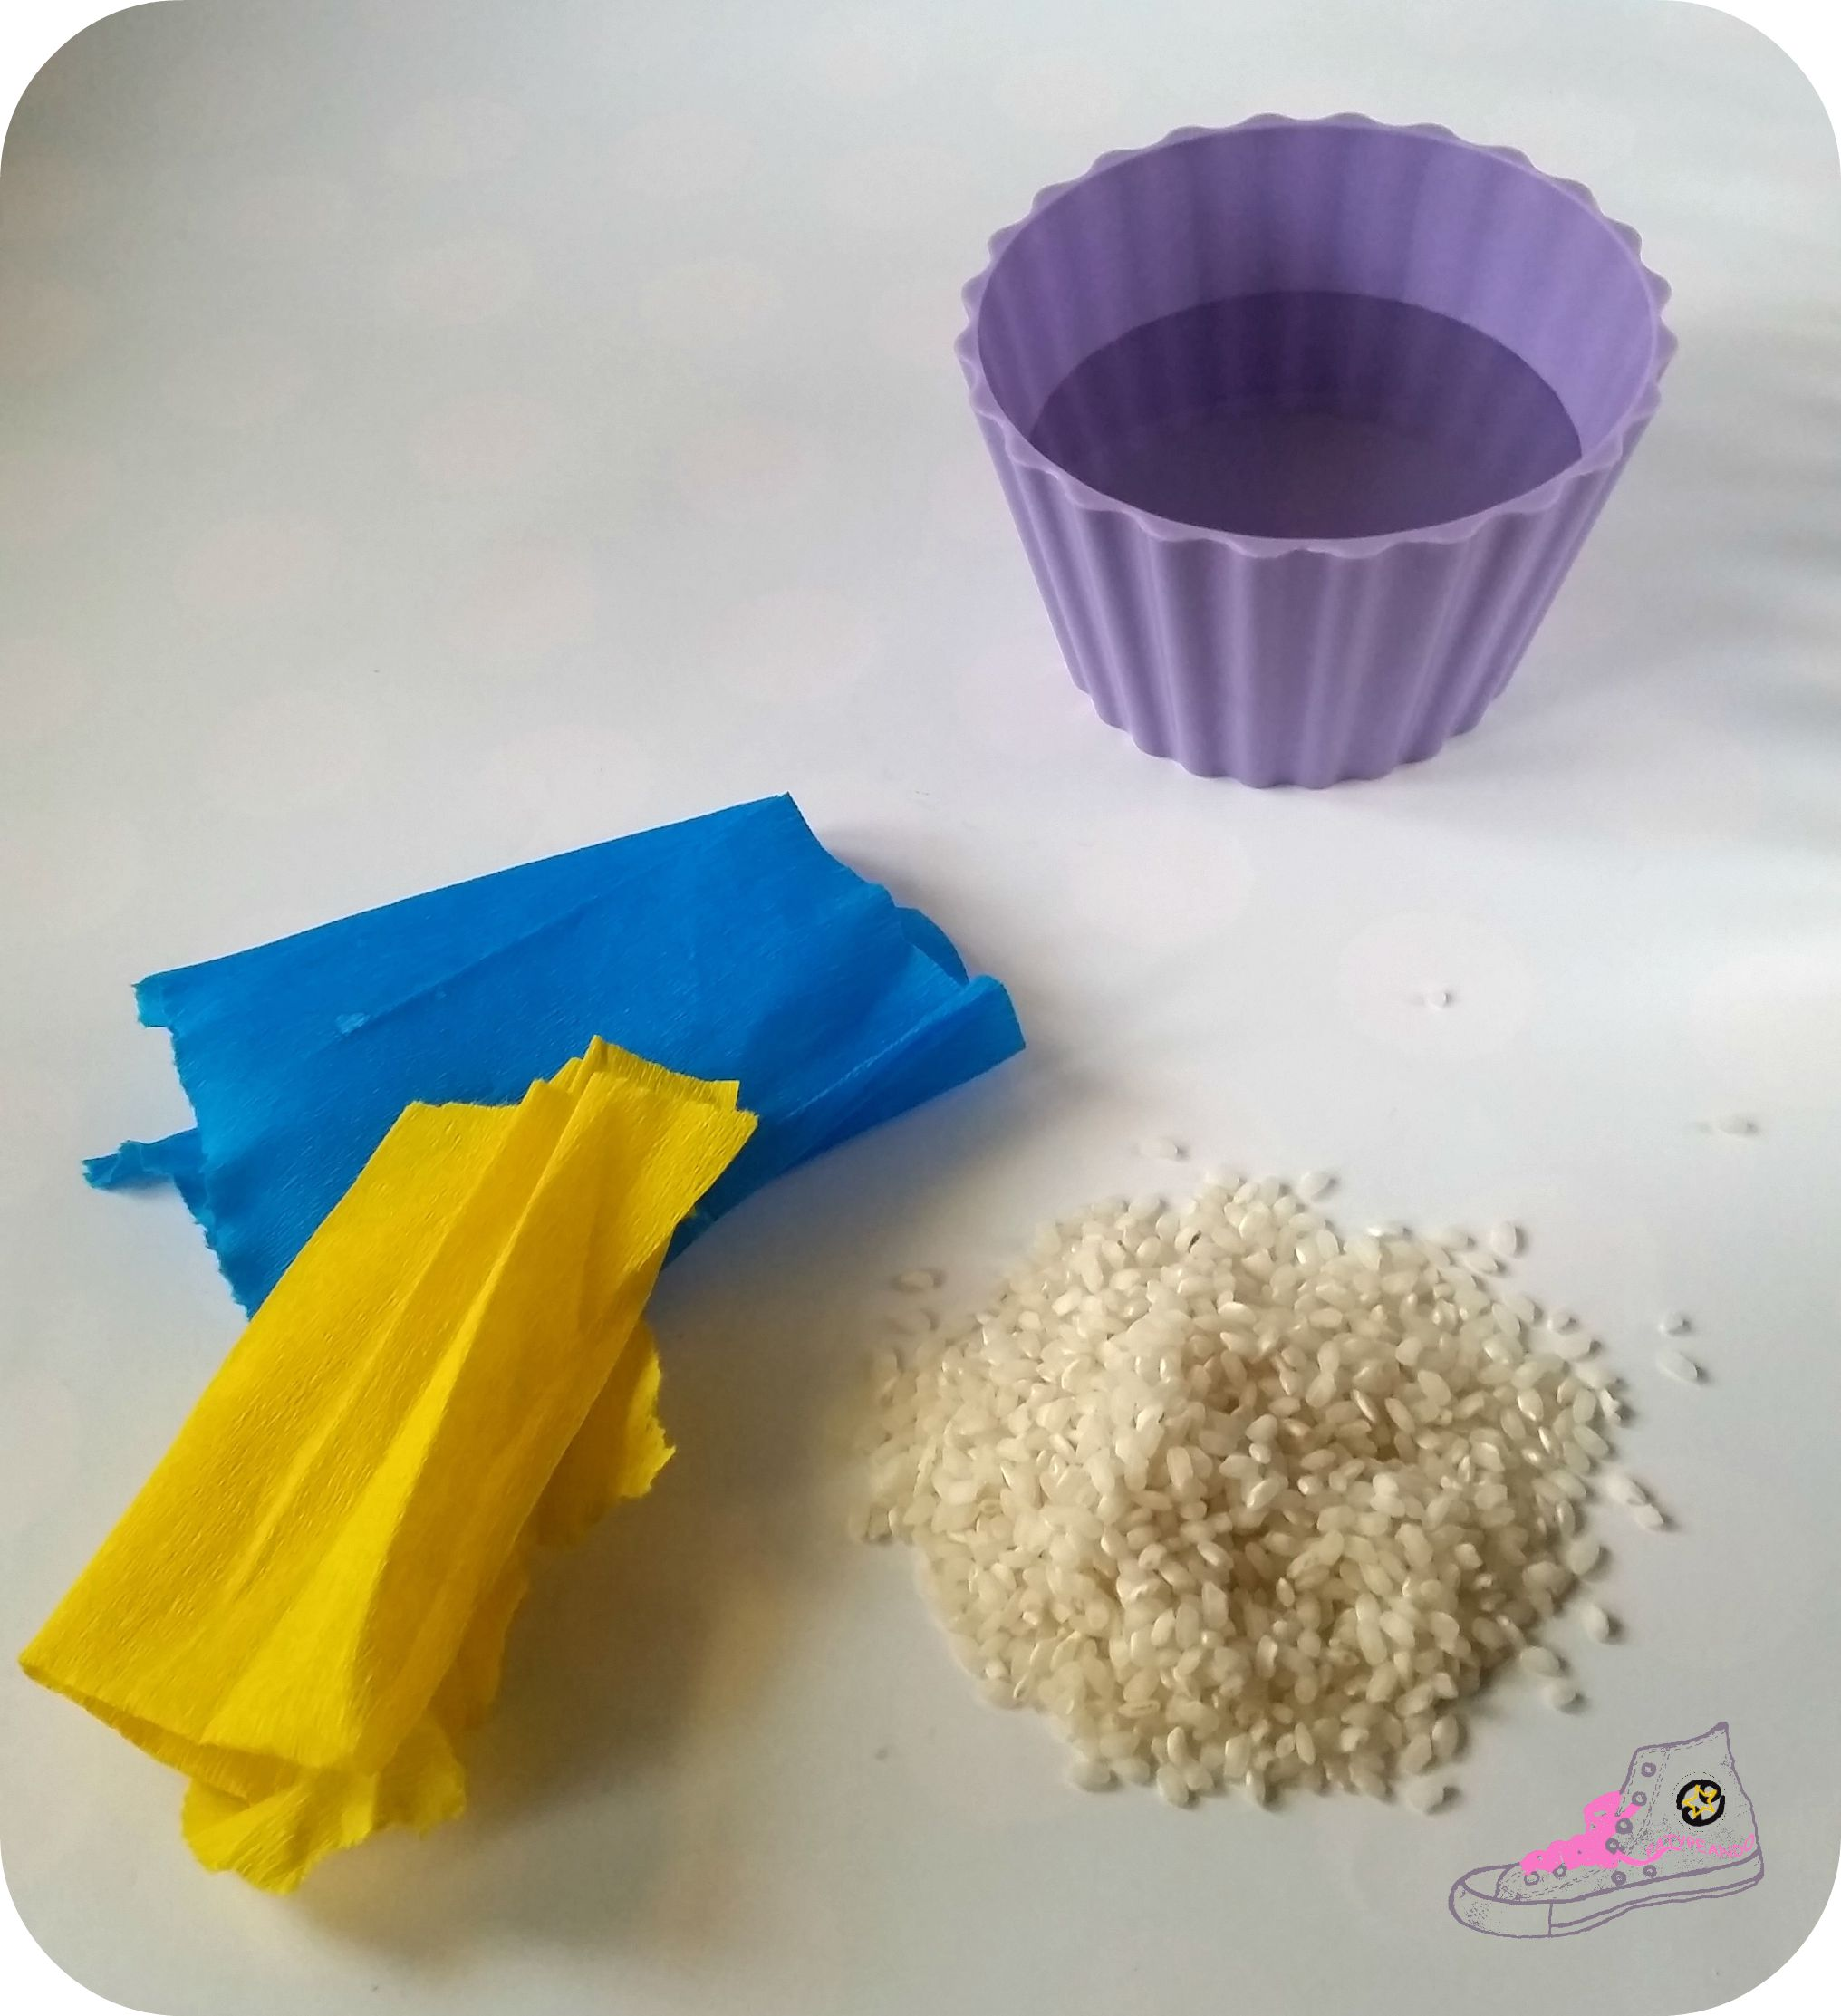 tiñiendo arroz